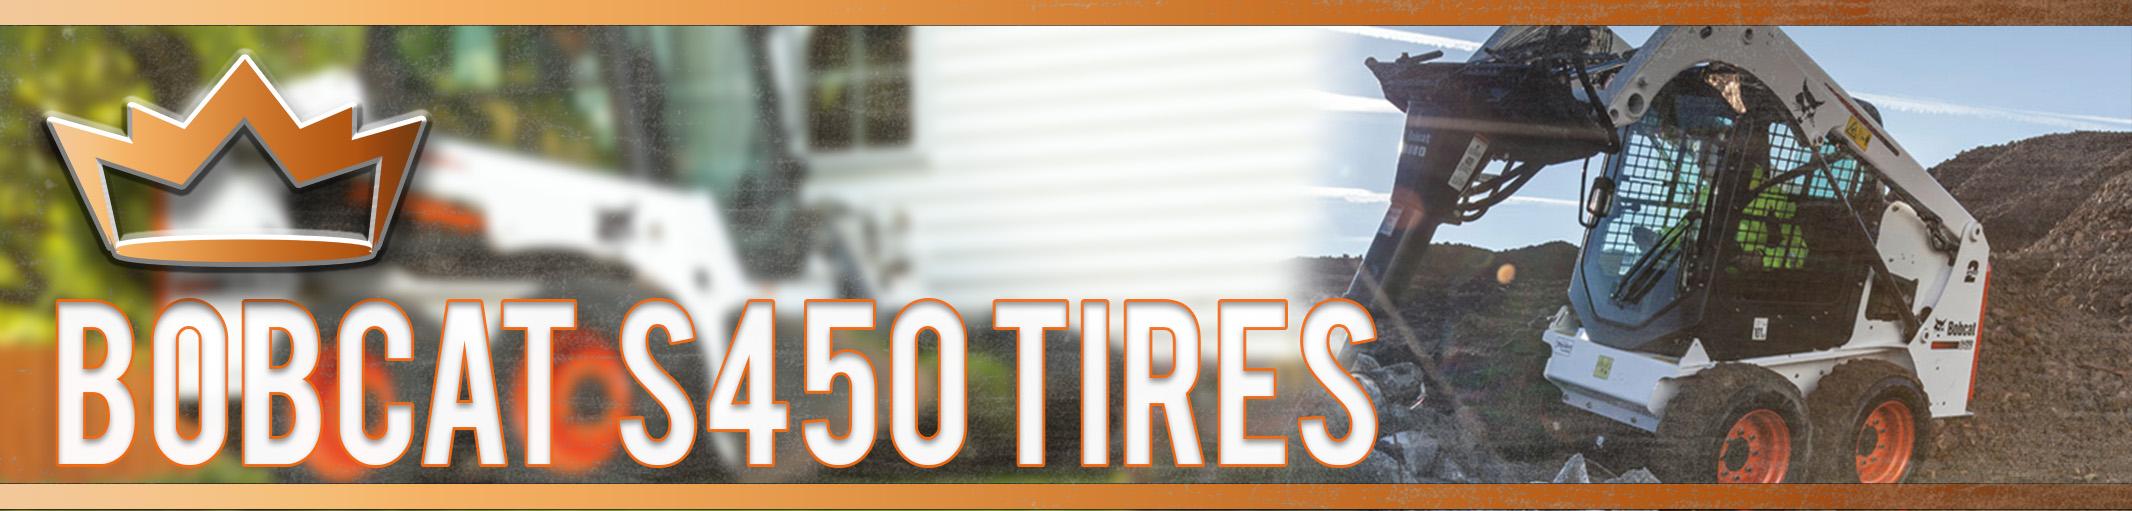 Bobcat S450 Skid Steer Tires